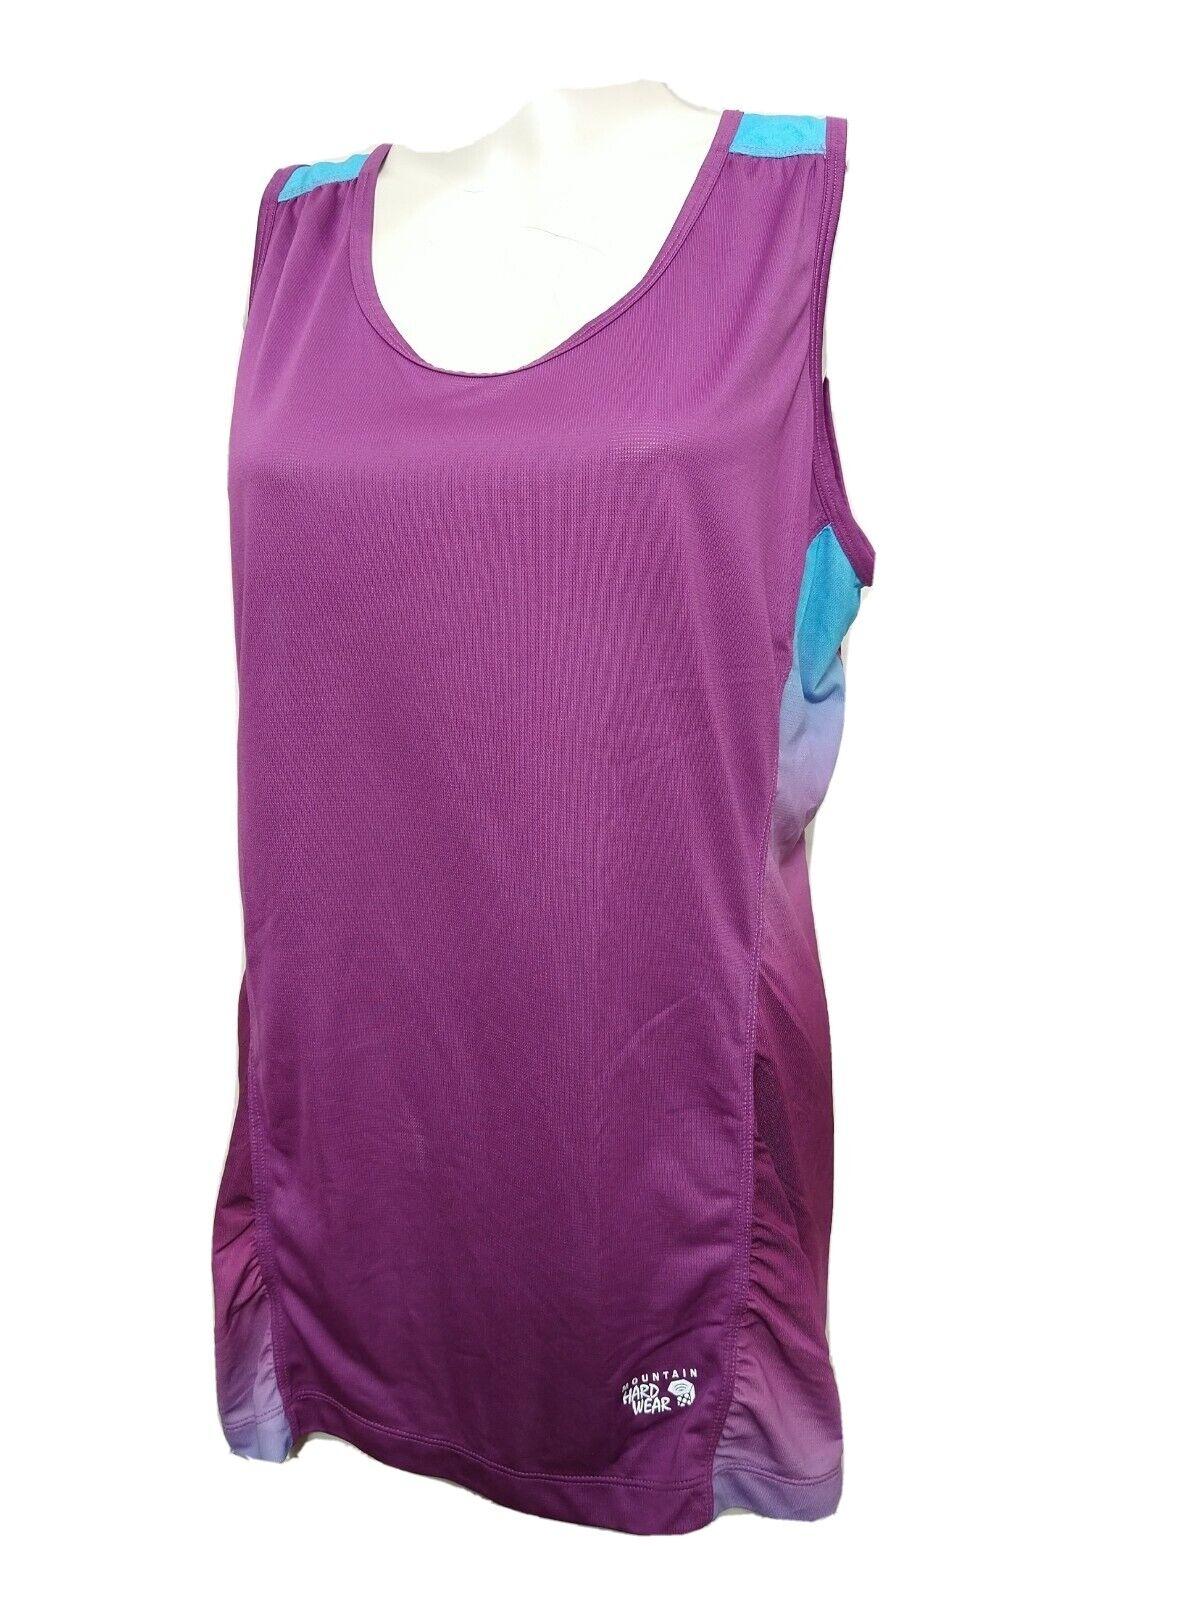 Mountain Hardwear WOMEN Large Sleeveless Scoop-neck Athletic Tank (#P3